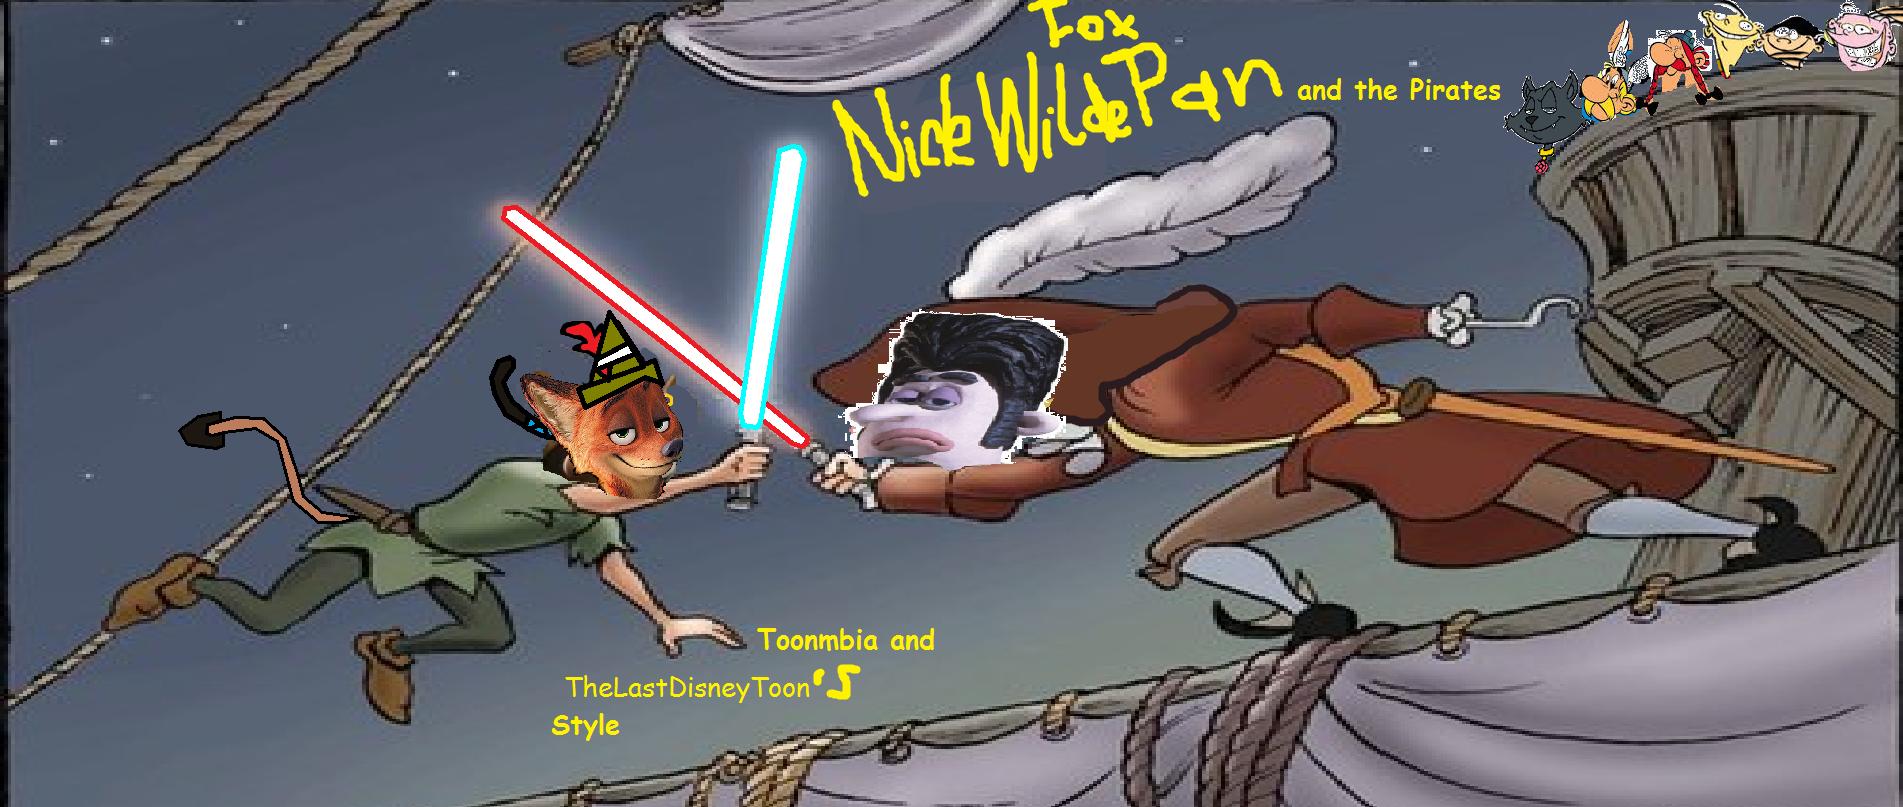 Fox Nick Wilde Pan and the Pirates (TheLastDisneyToon and Toonmbia Style)